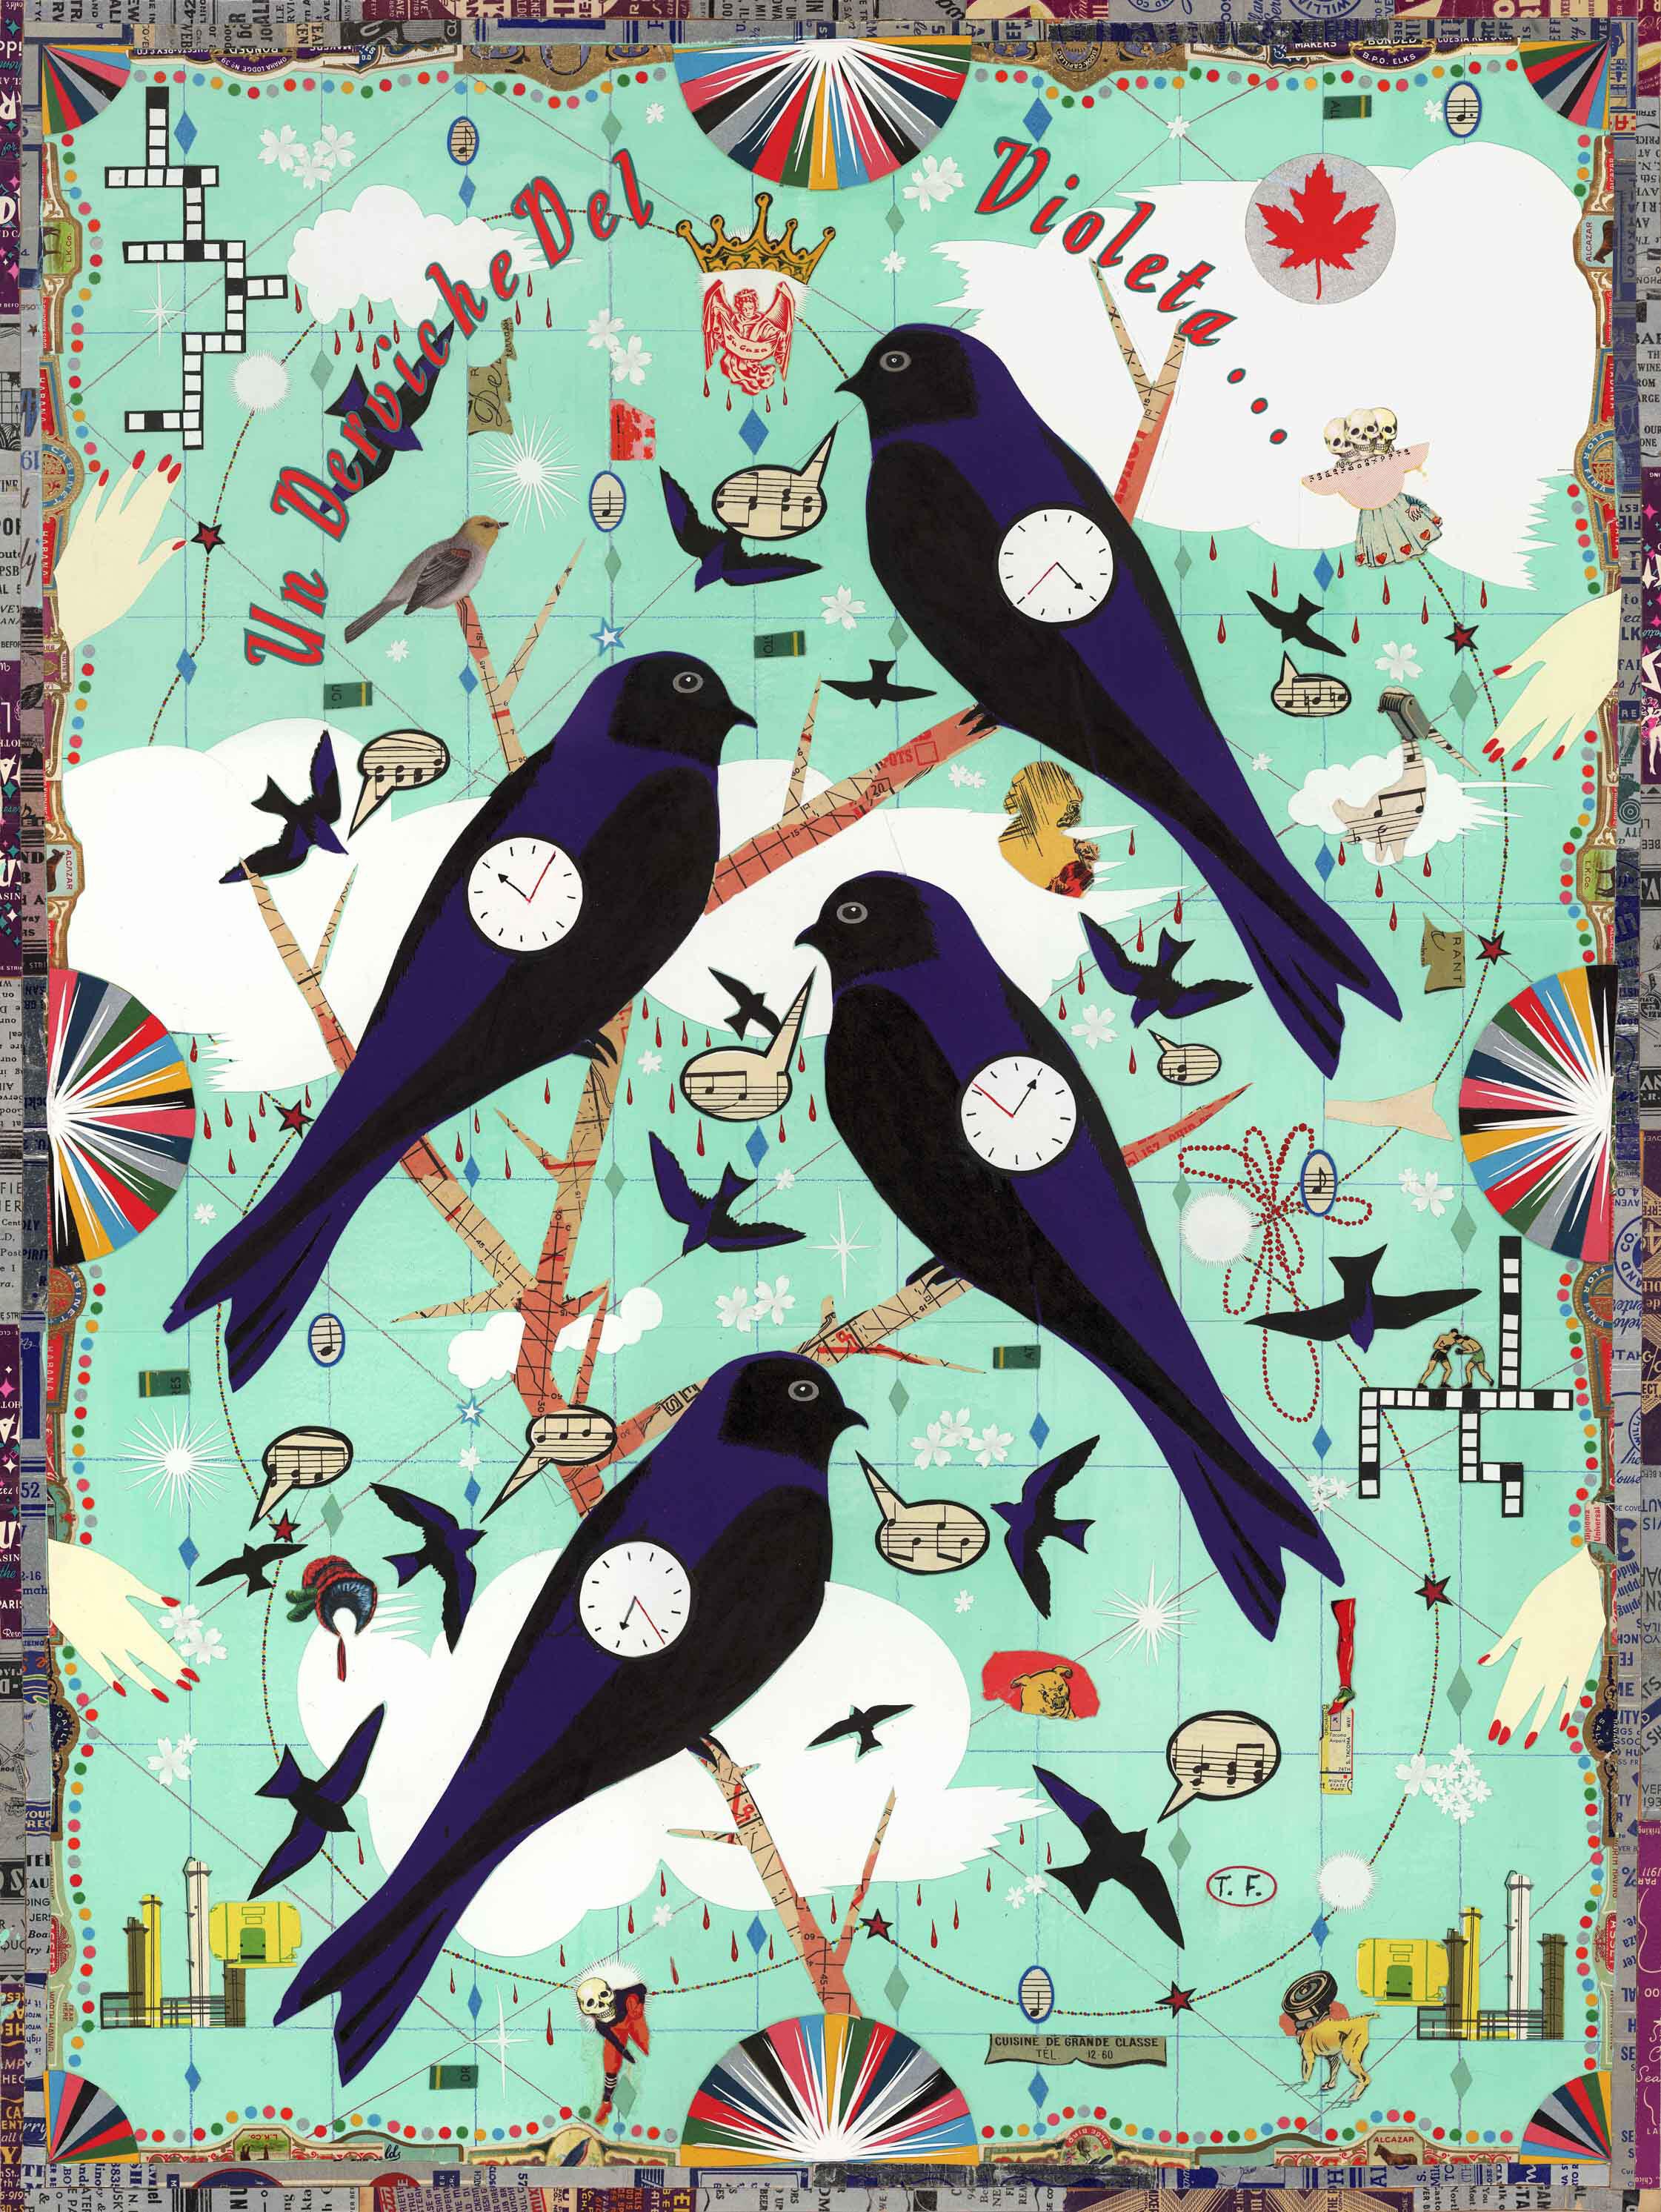 """A Dervish of Violet (Purple Martins)."" Illustration: Tony Fitzpatrick"